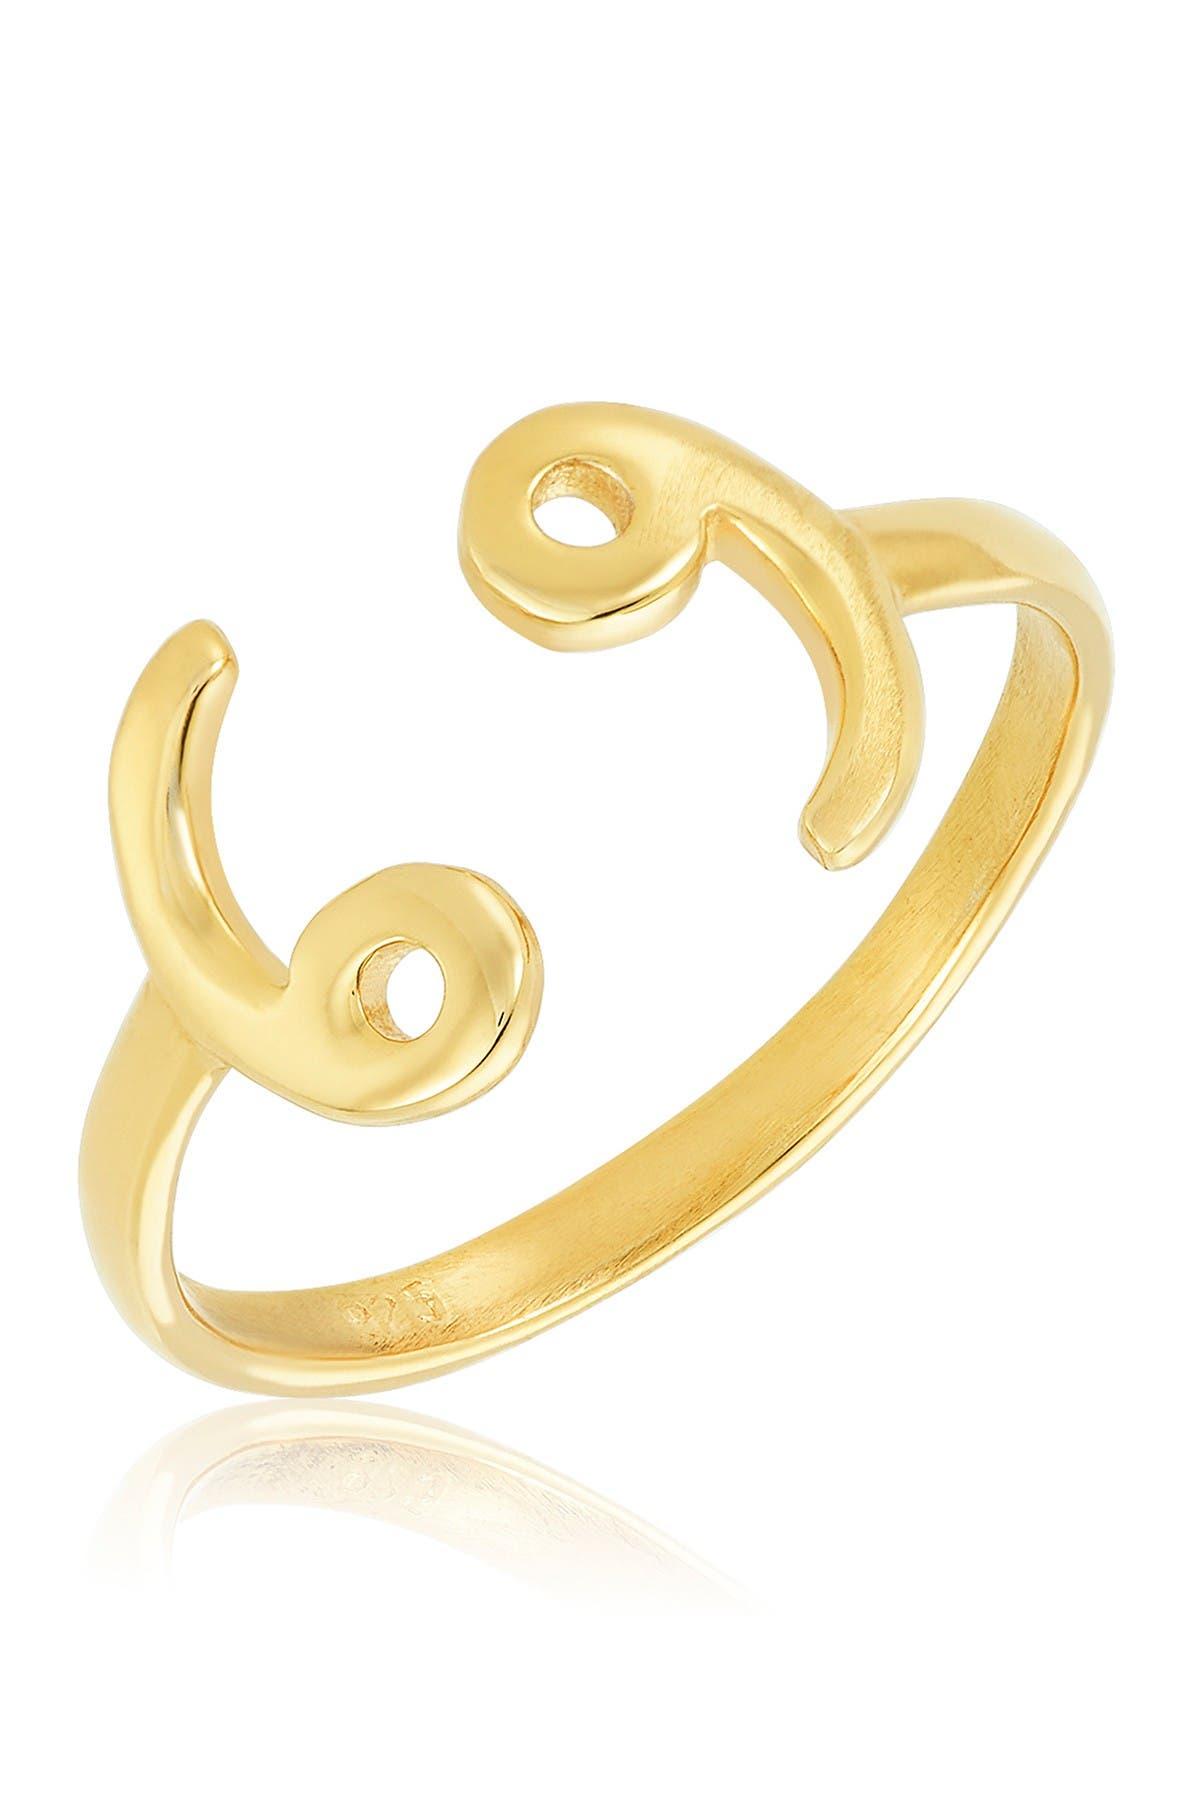 Image of Sterling Forever 14K Gold Vermeil Plated Sterling Silver Adjustable Zodiac Ring - Cancer